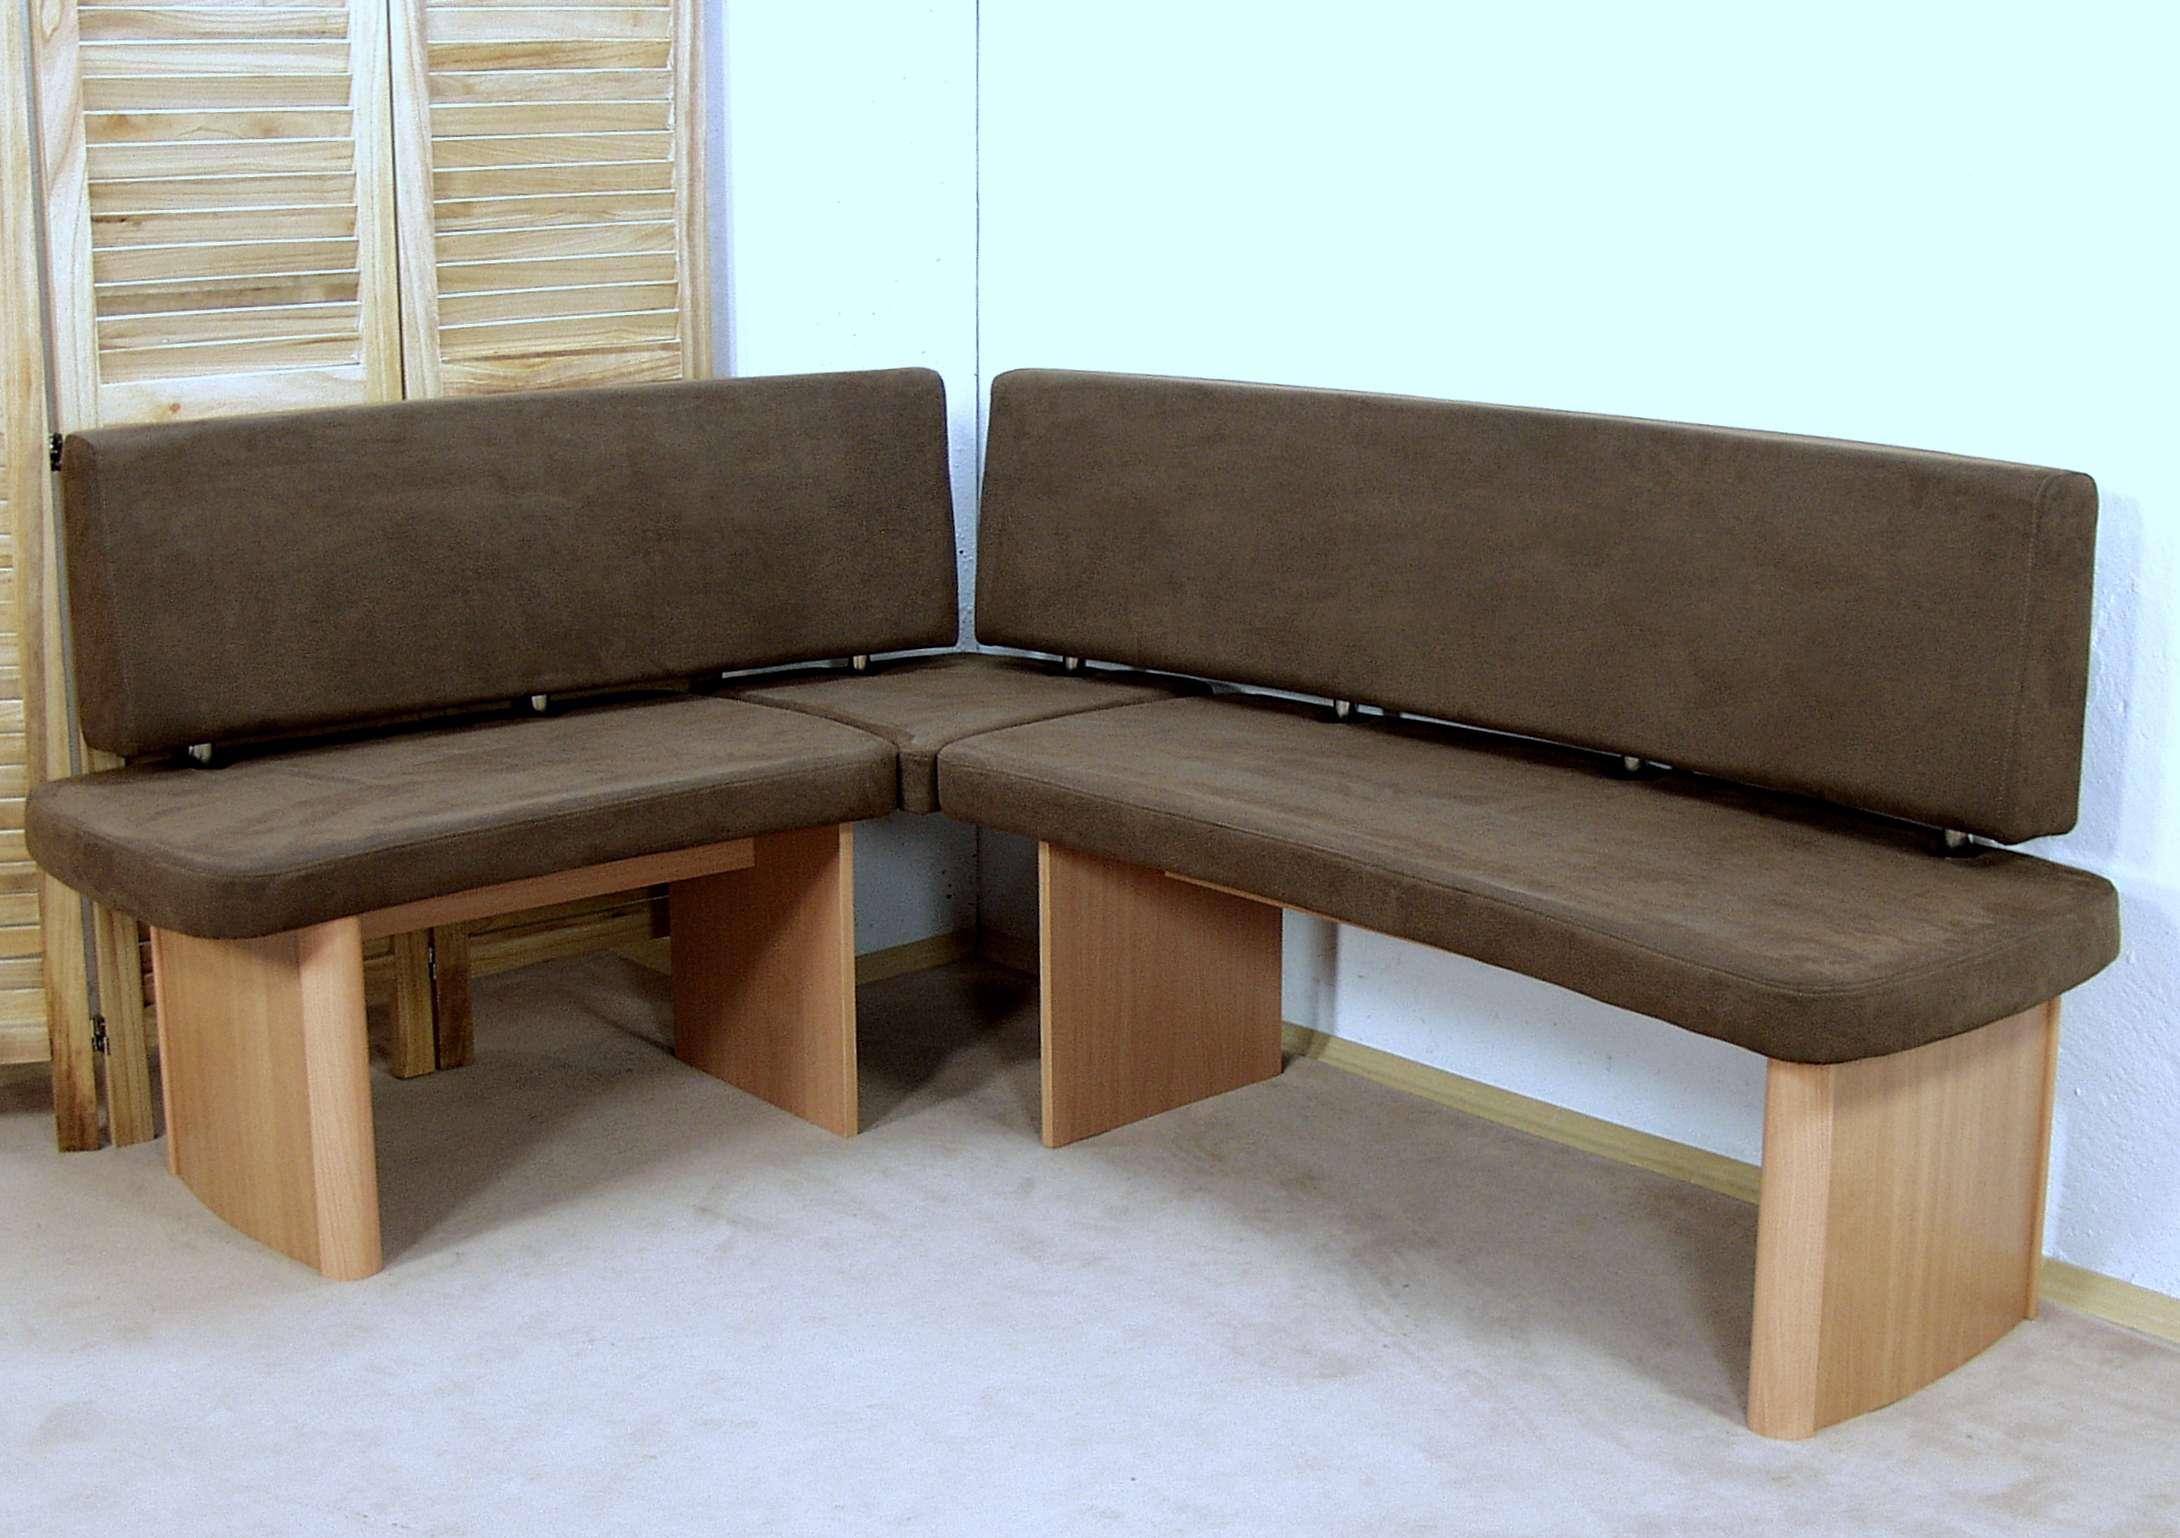 eckbank ikea angebote auf waterige. Black Bedroom Furniture Sets. Home Design Ideas